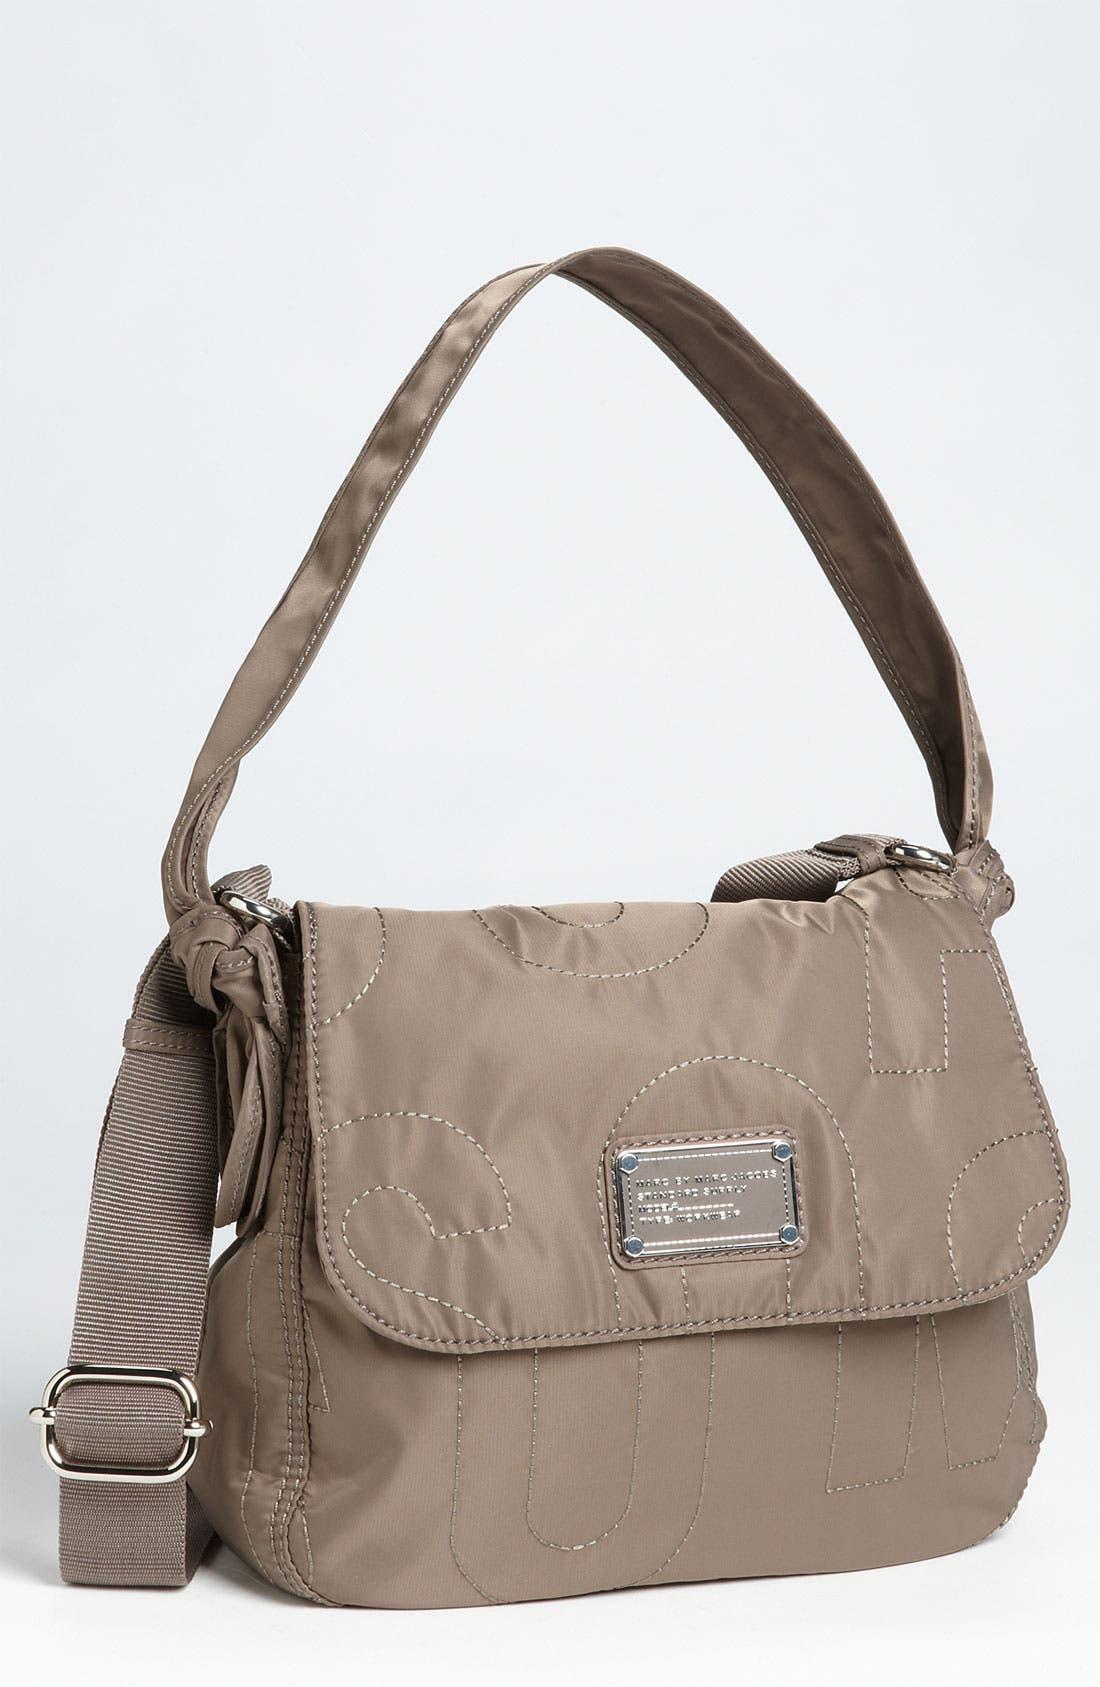 Main Image - MARC BY MARC JACOBS 'Pretty Nylon - Little Ukita' Convertible Crossbody Flap Bag